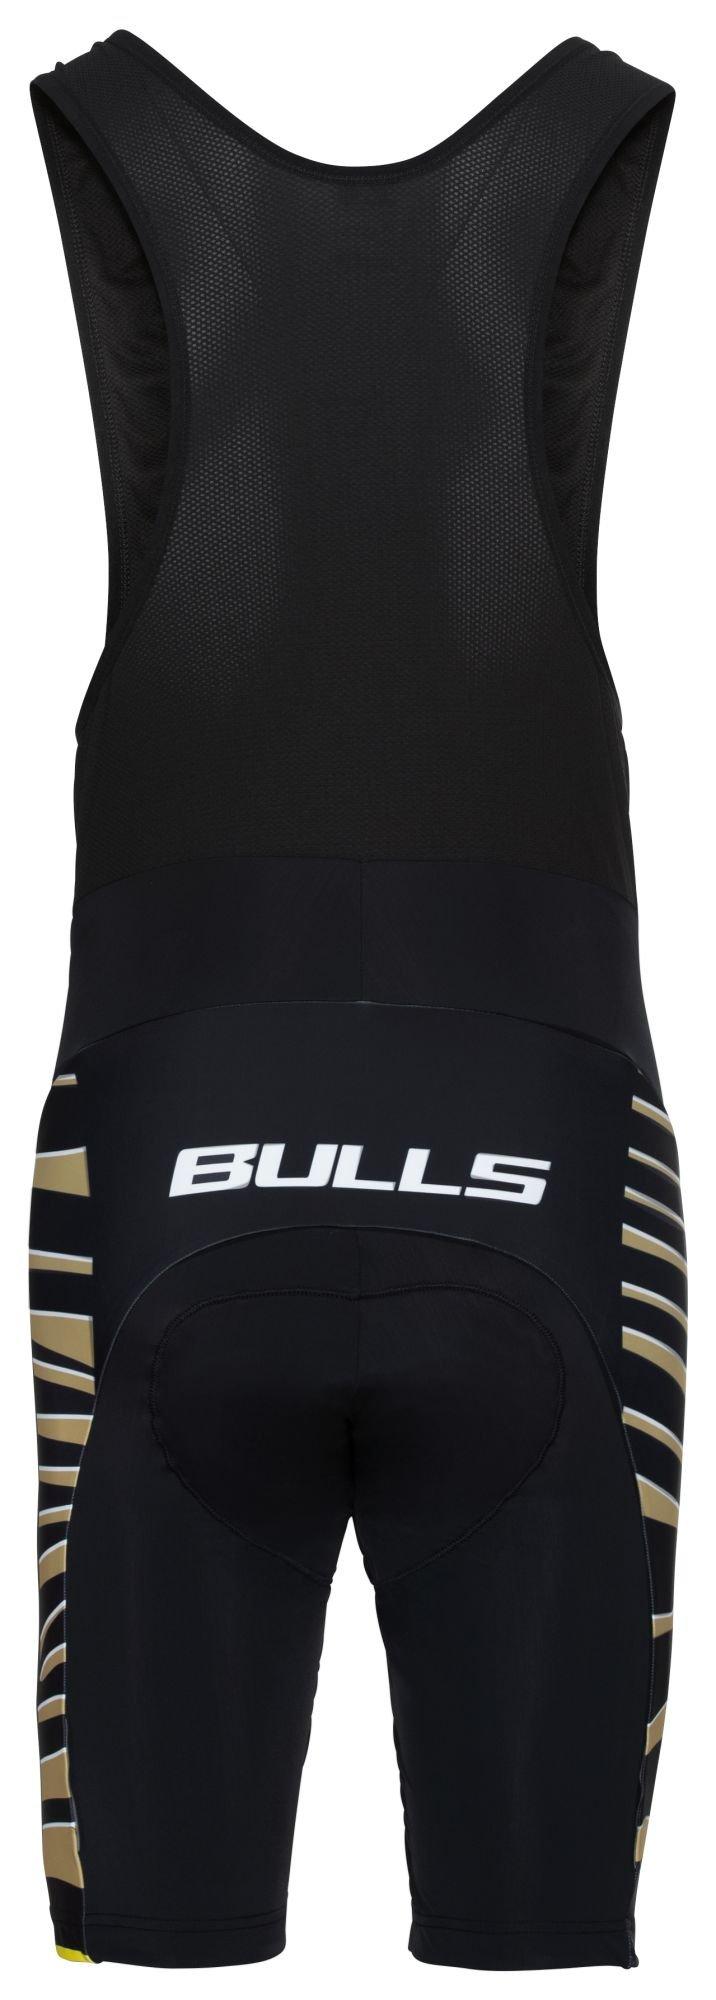 BULLS Shorts Bibshorts Zebra